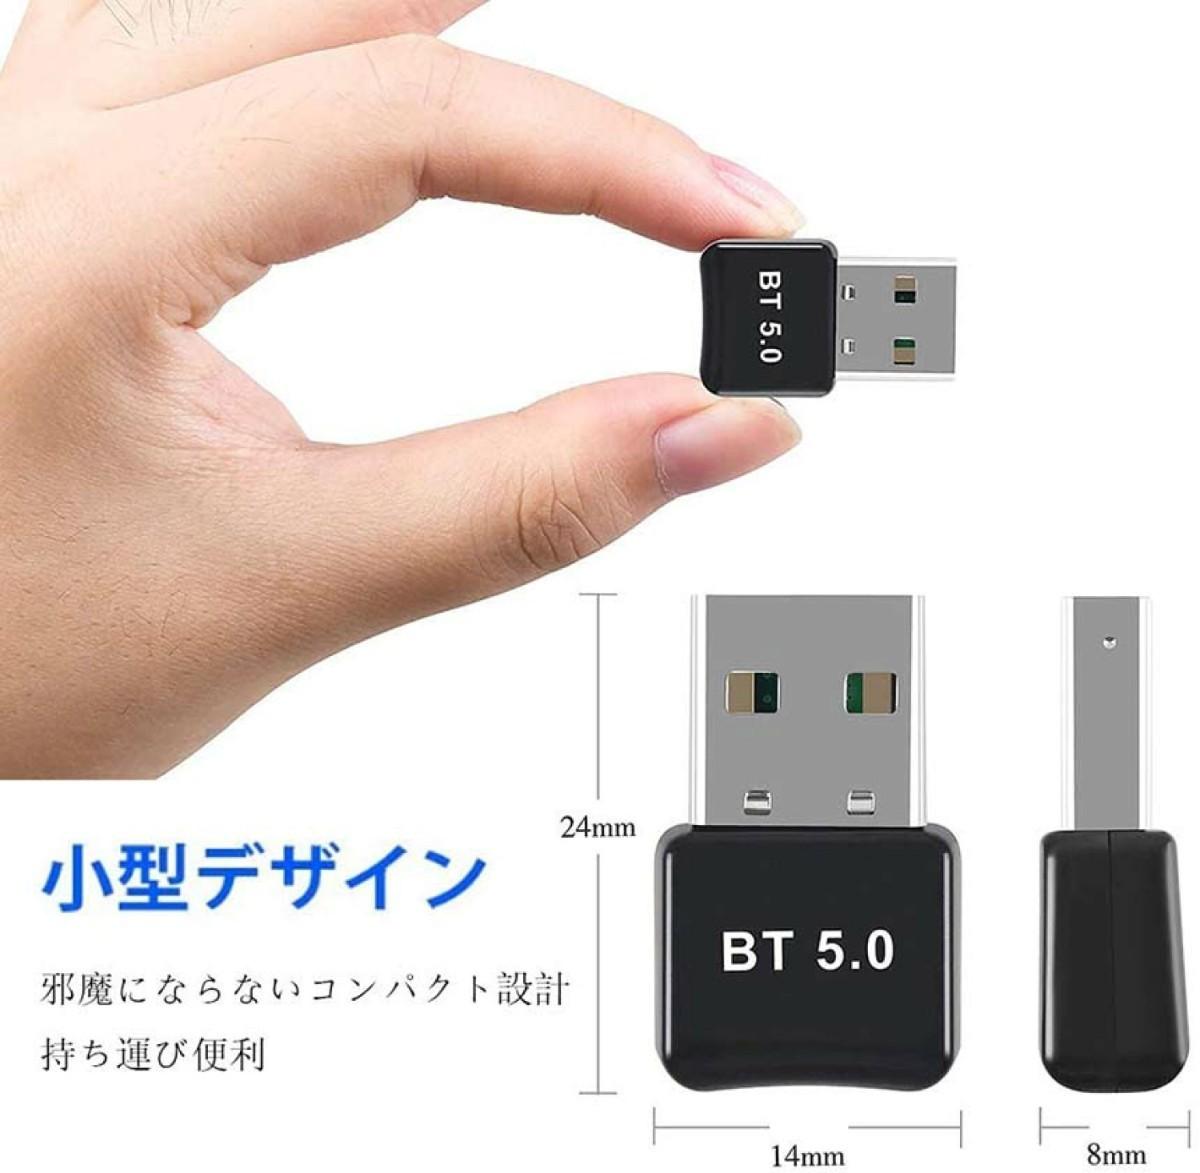 bluetooth 5.0 アダプター ブルートゥースアダプタ 受信機 子機 PC用  WiFi 無線LAN 子機 アダプター